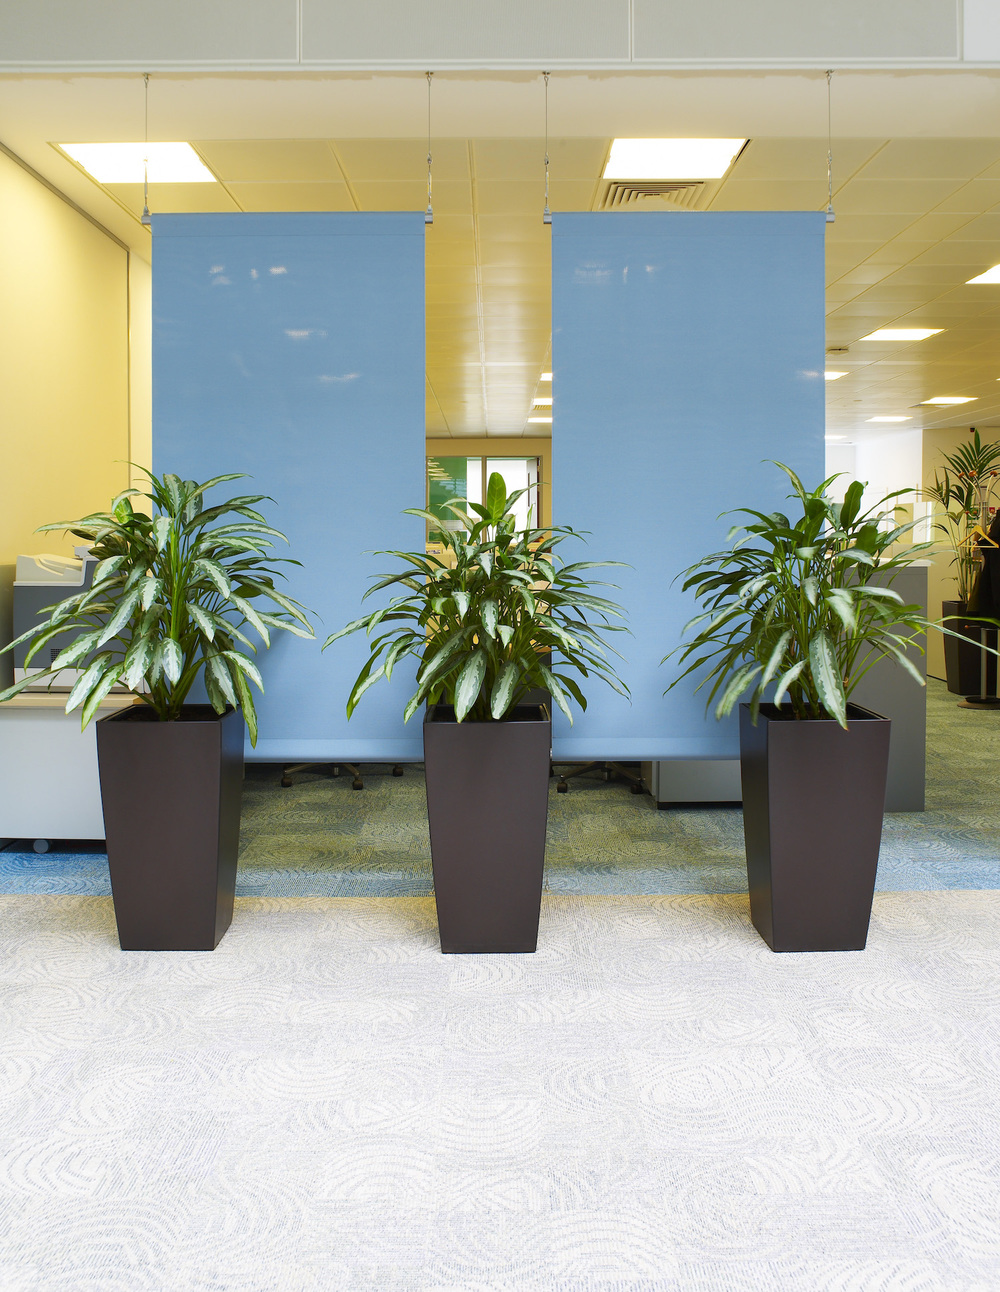 dac-beachcroft-plantcare-interior-plants-trees-bristol-image-3